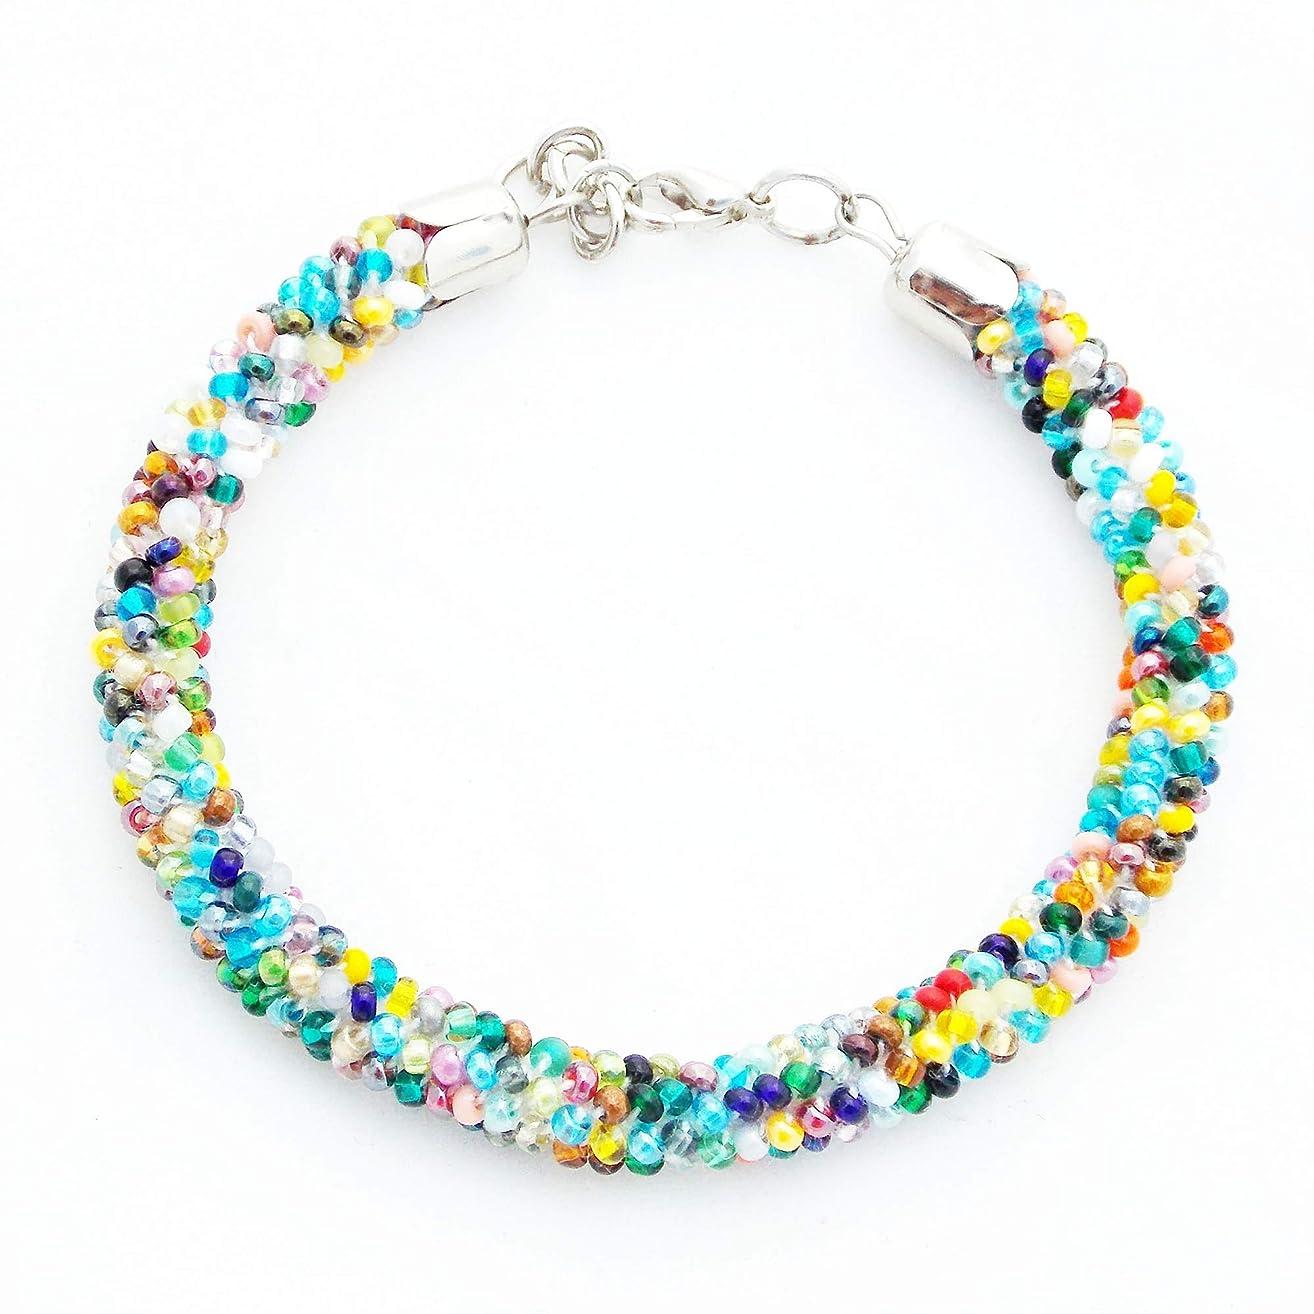 Handmade Colorful minimalist bracelet Crochet dainty bracelet Rainbow confetti bracelet for women Gift idea for mom Beaded stackable bracelet